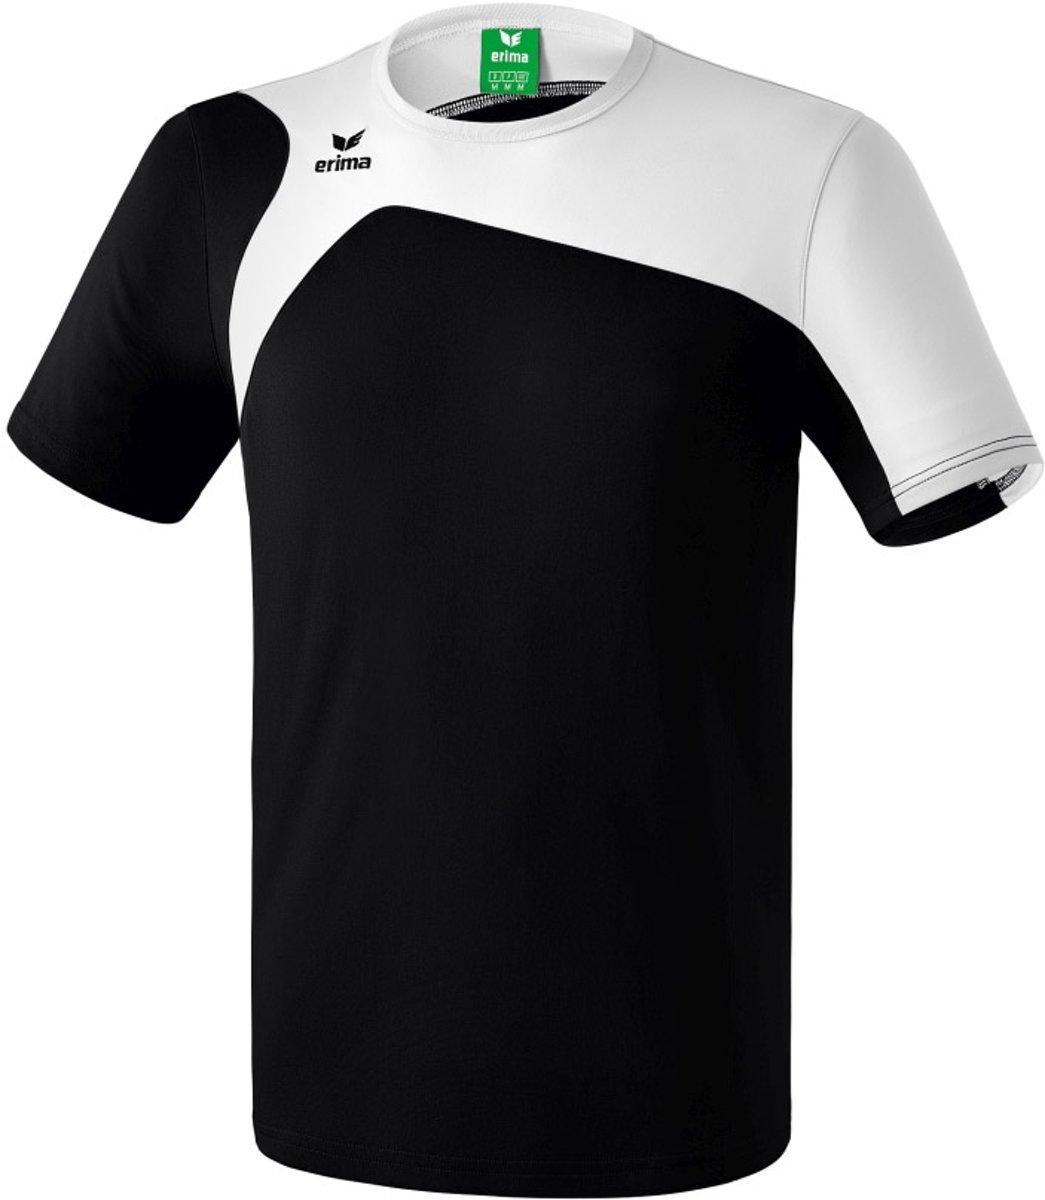 Erima Kinder Scorer Line Training T-Shirt